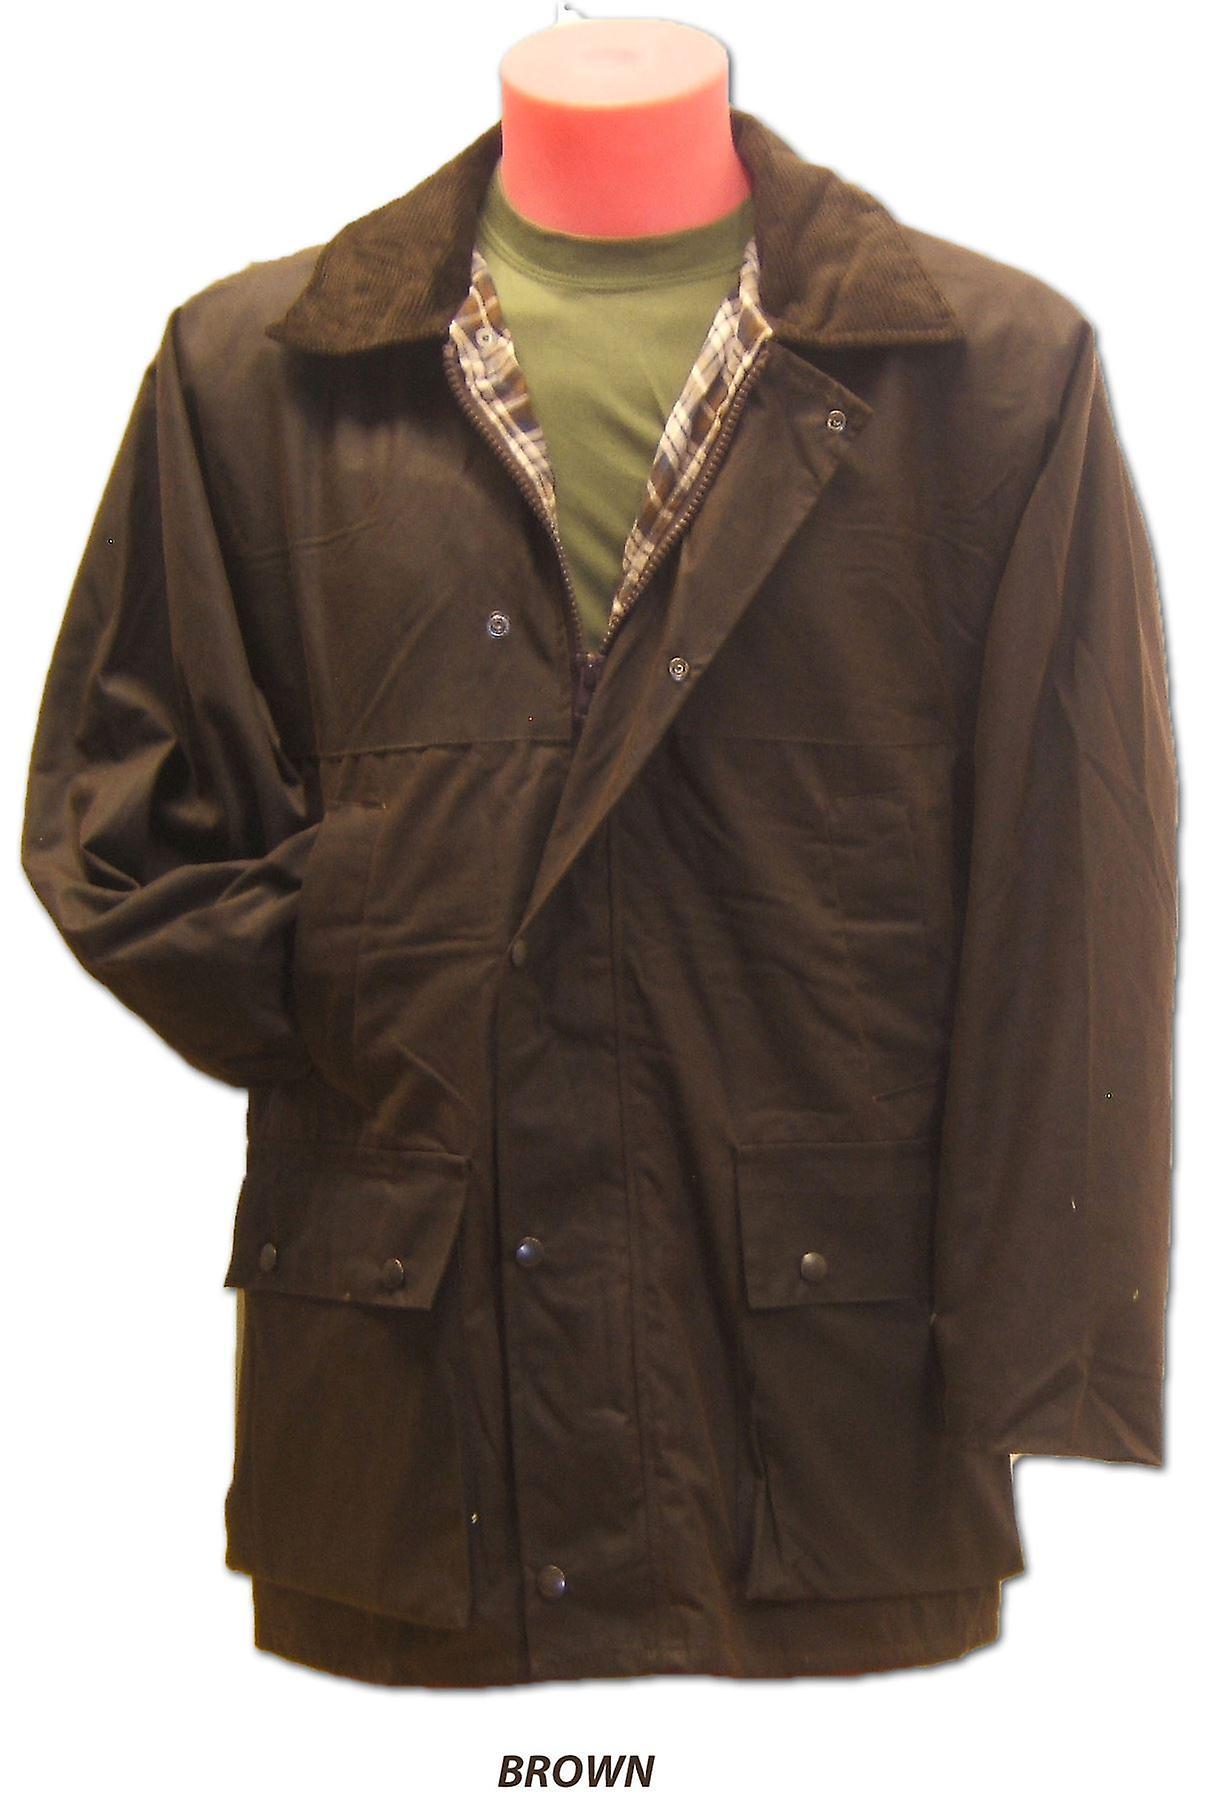 Brand New Cotton Wax Riding Hunting Jacket